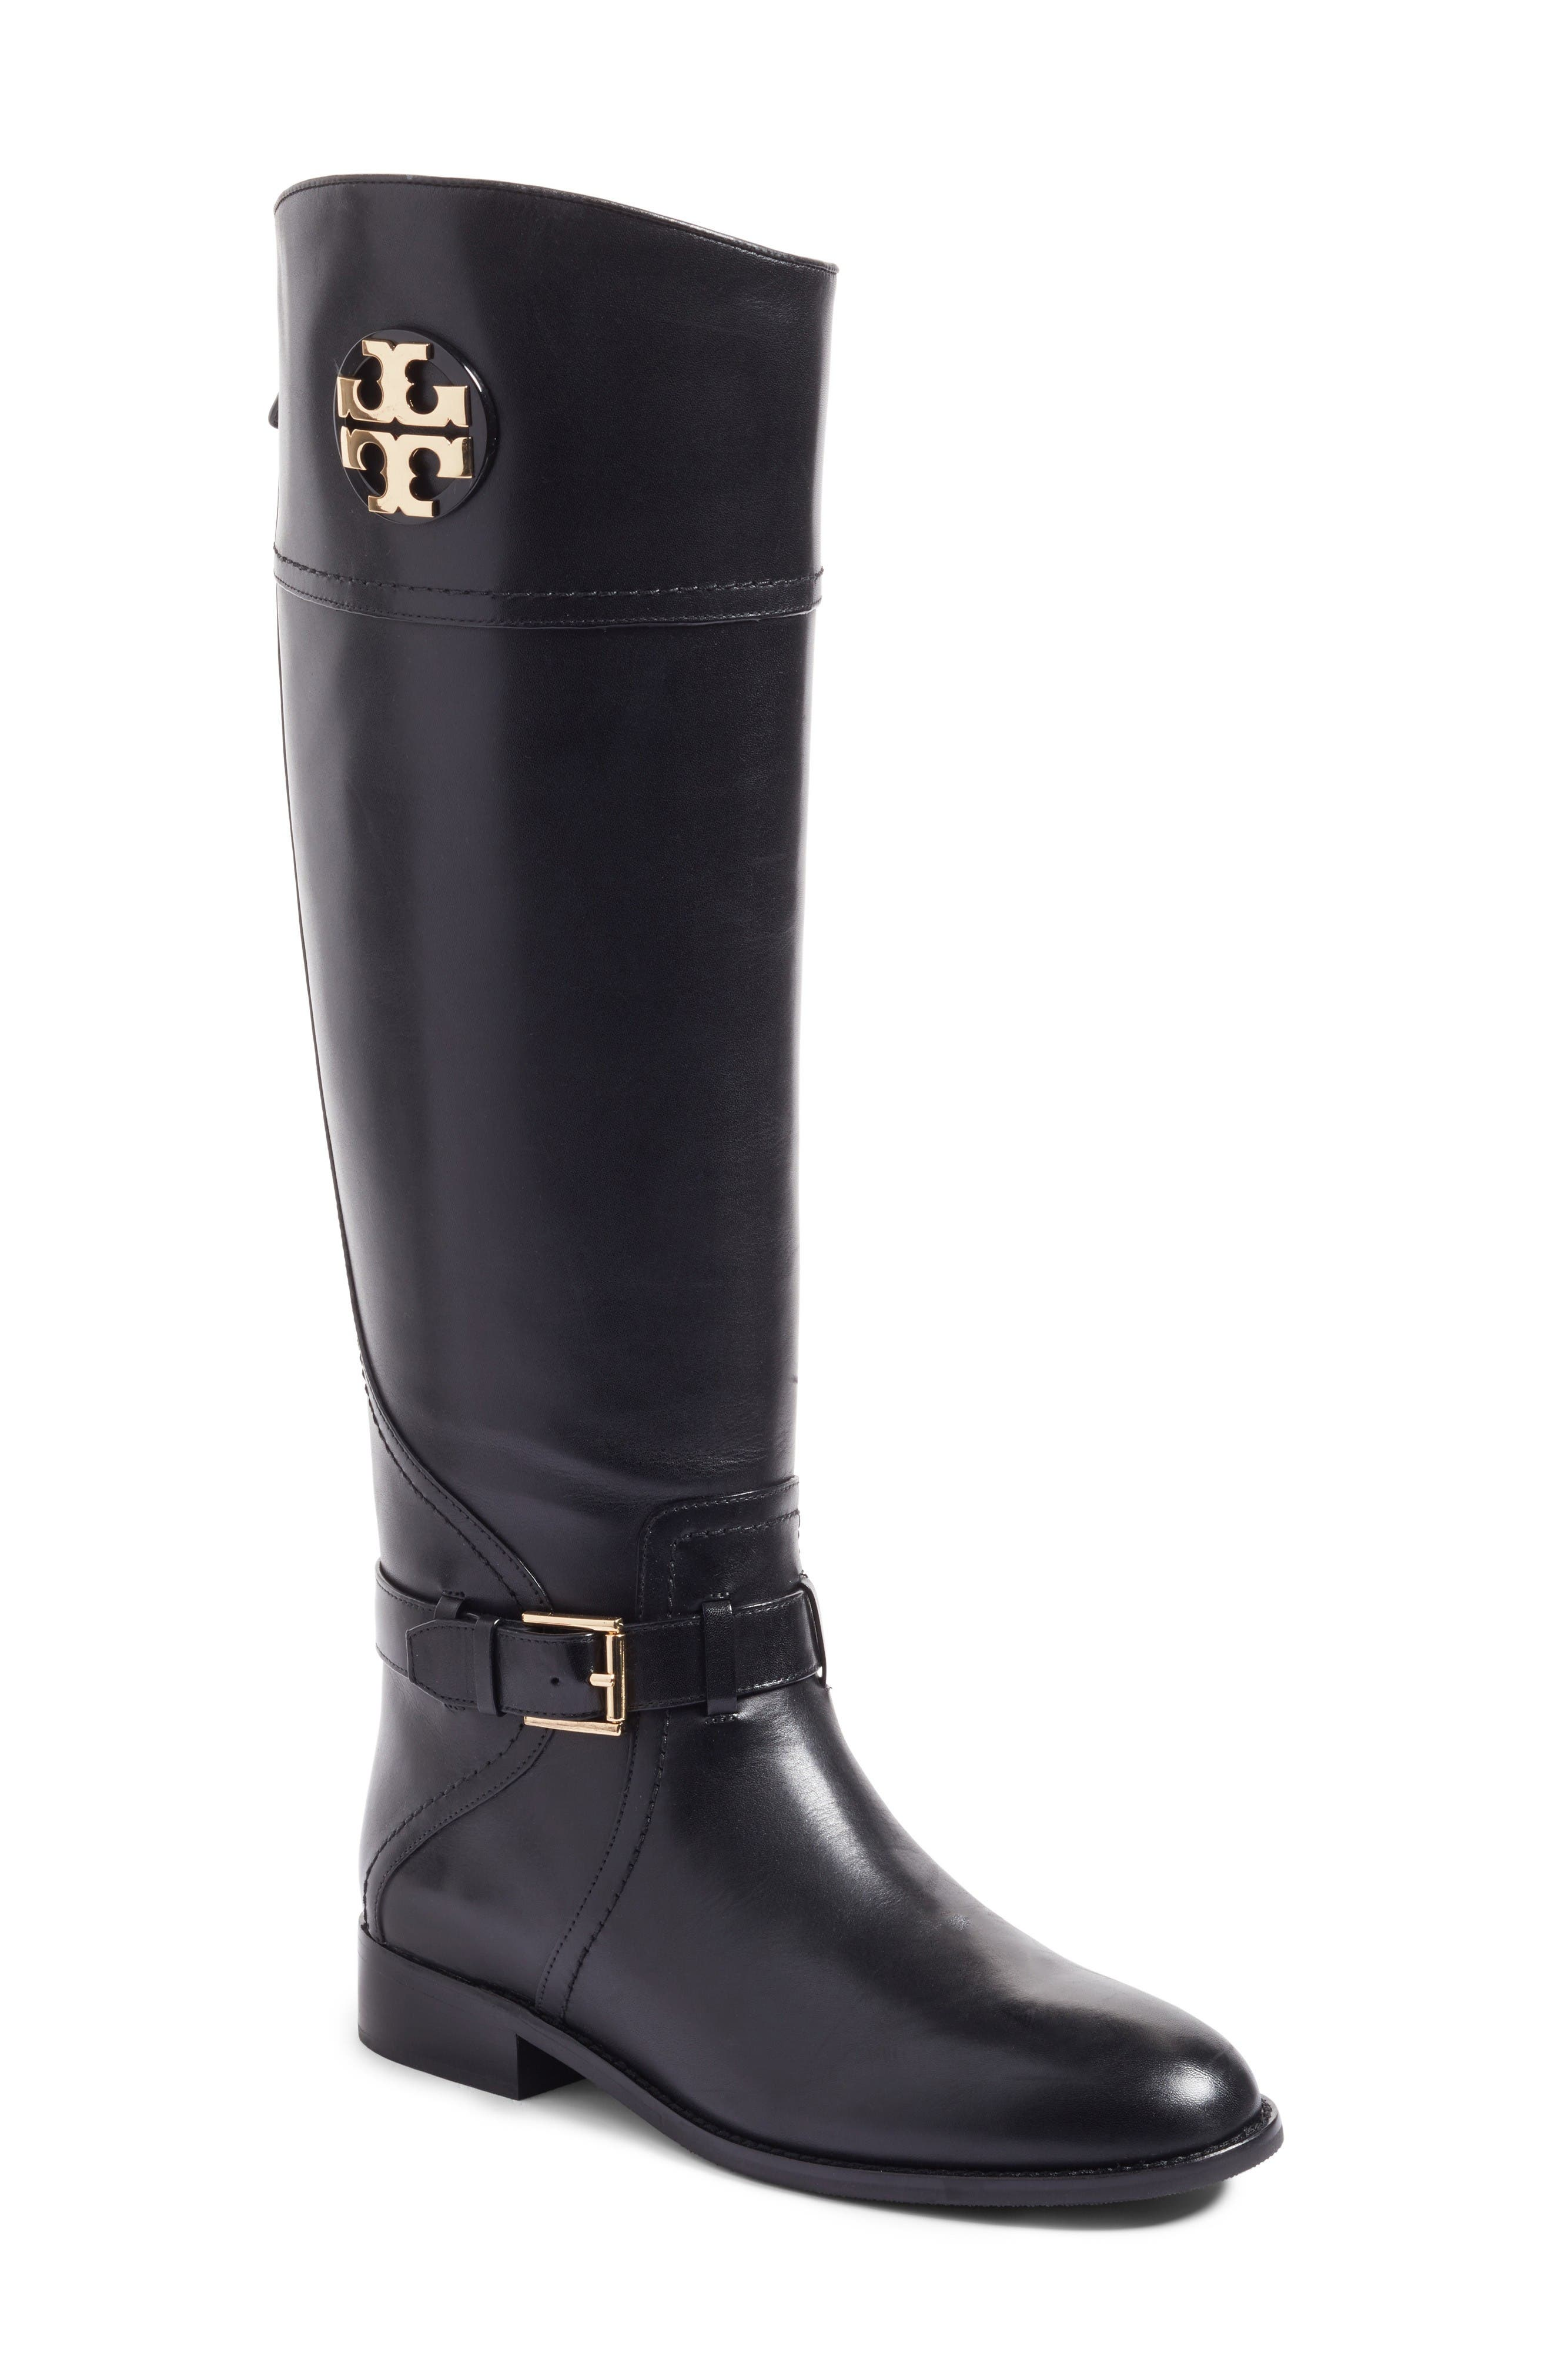 Alternate Image 1 Selected - Tory Burch Adeline Boot (Women) (Regular & Wide Calf)